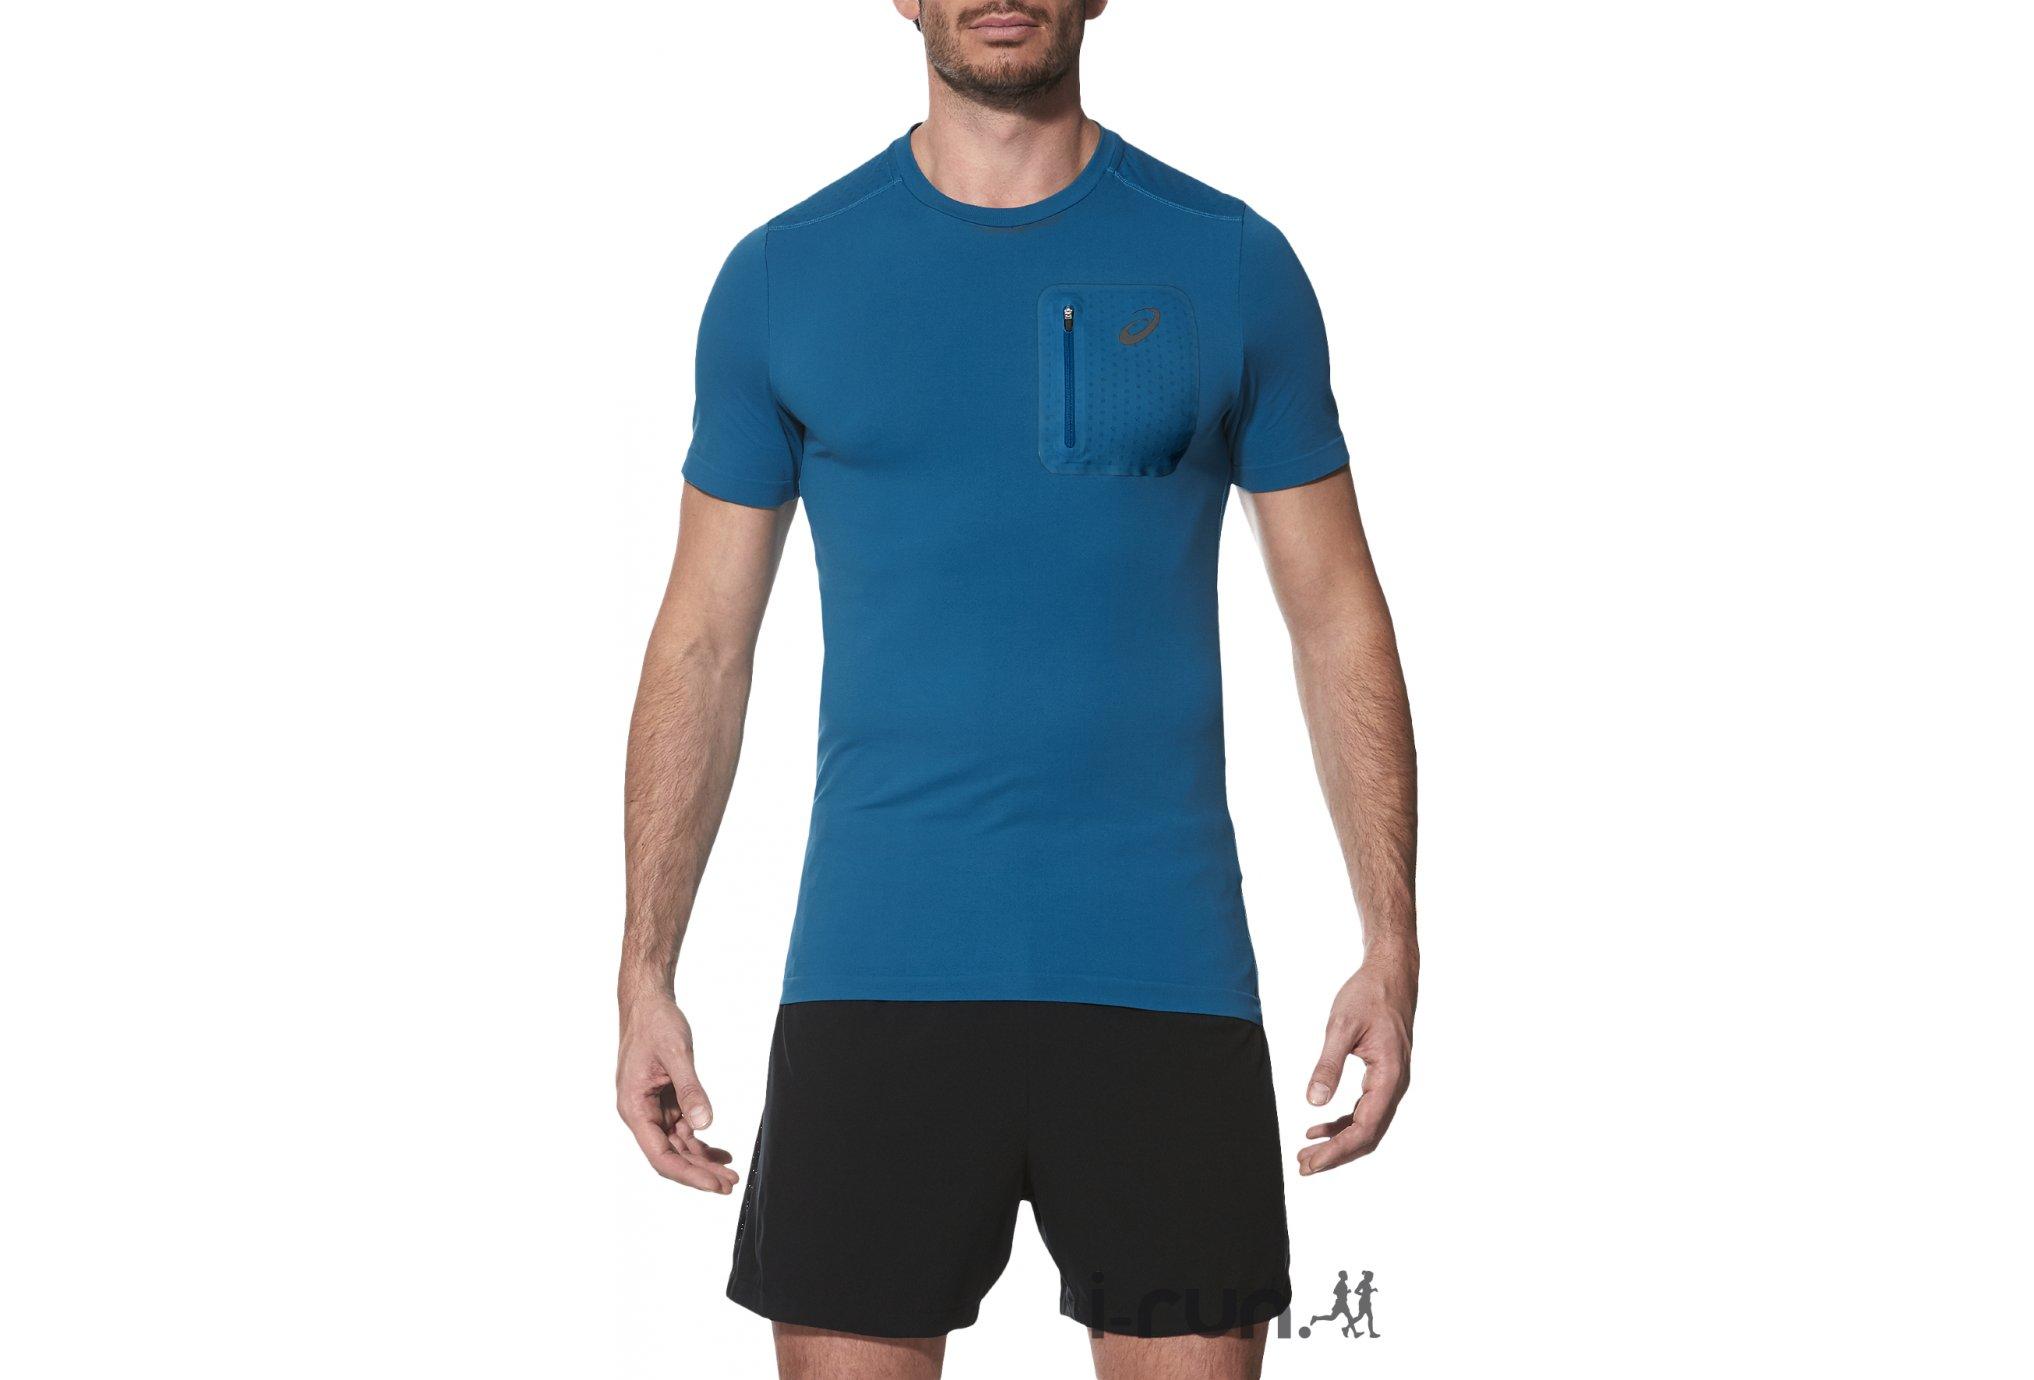 Asics Elite SS Top M vêtement running homme